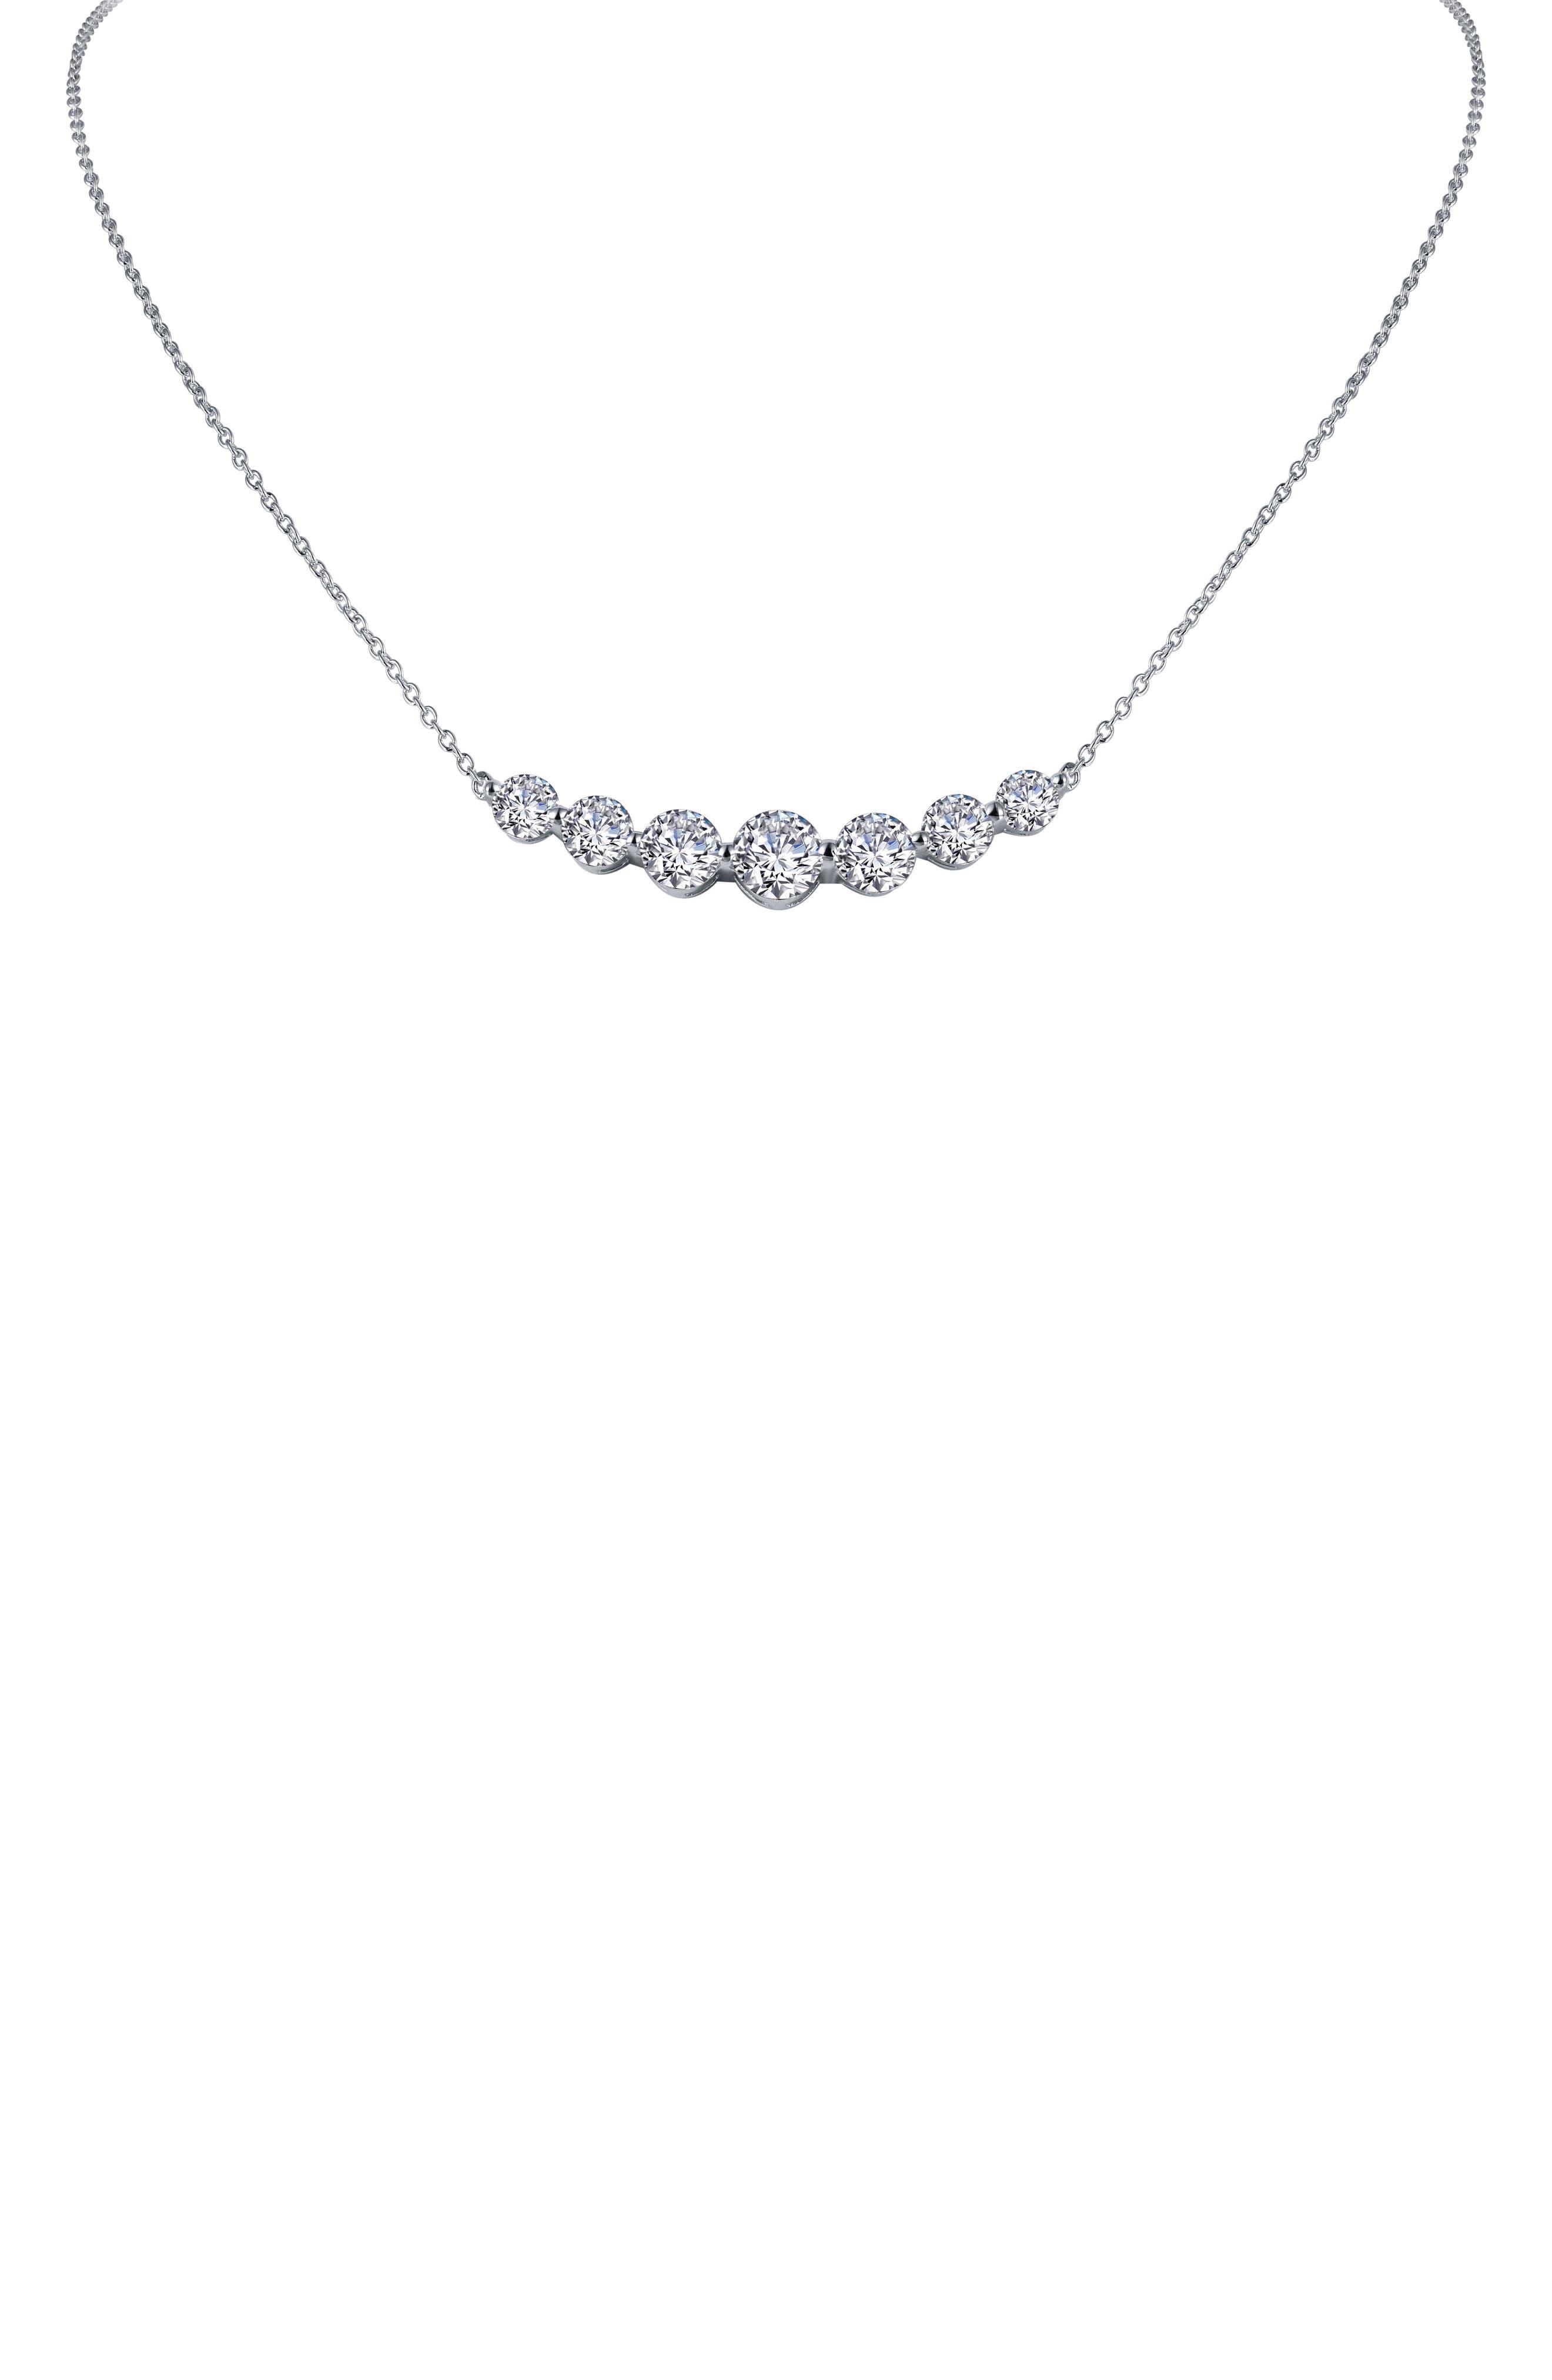 Seven Symbols Of Joy Simulated Diamond Necklace